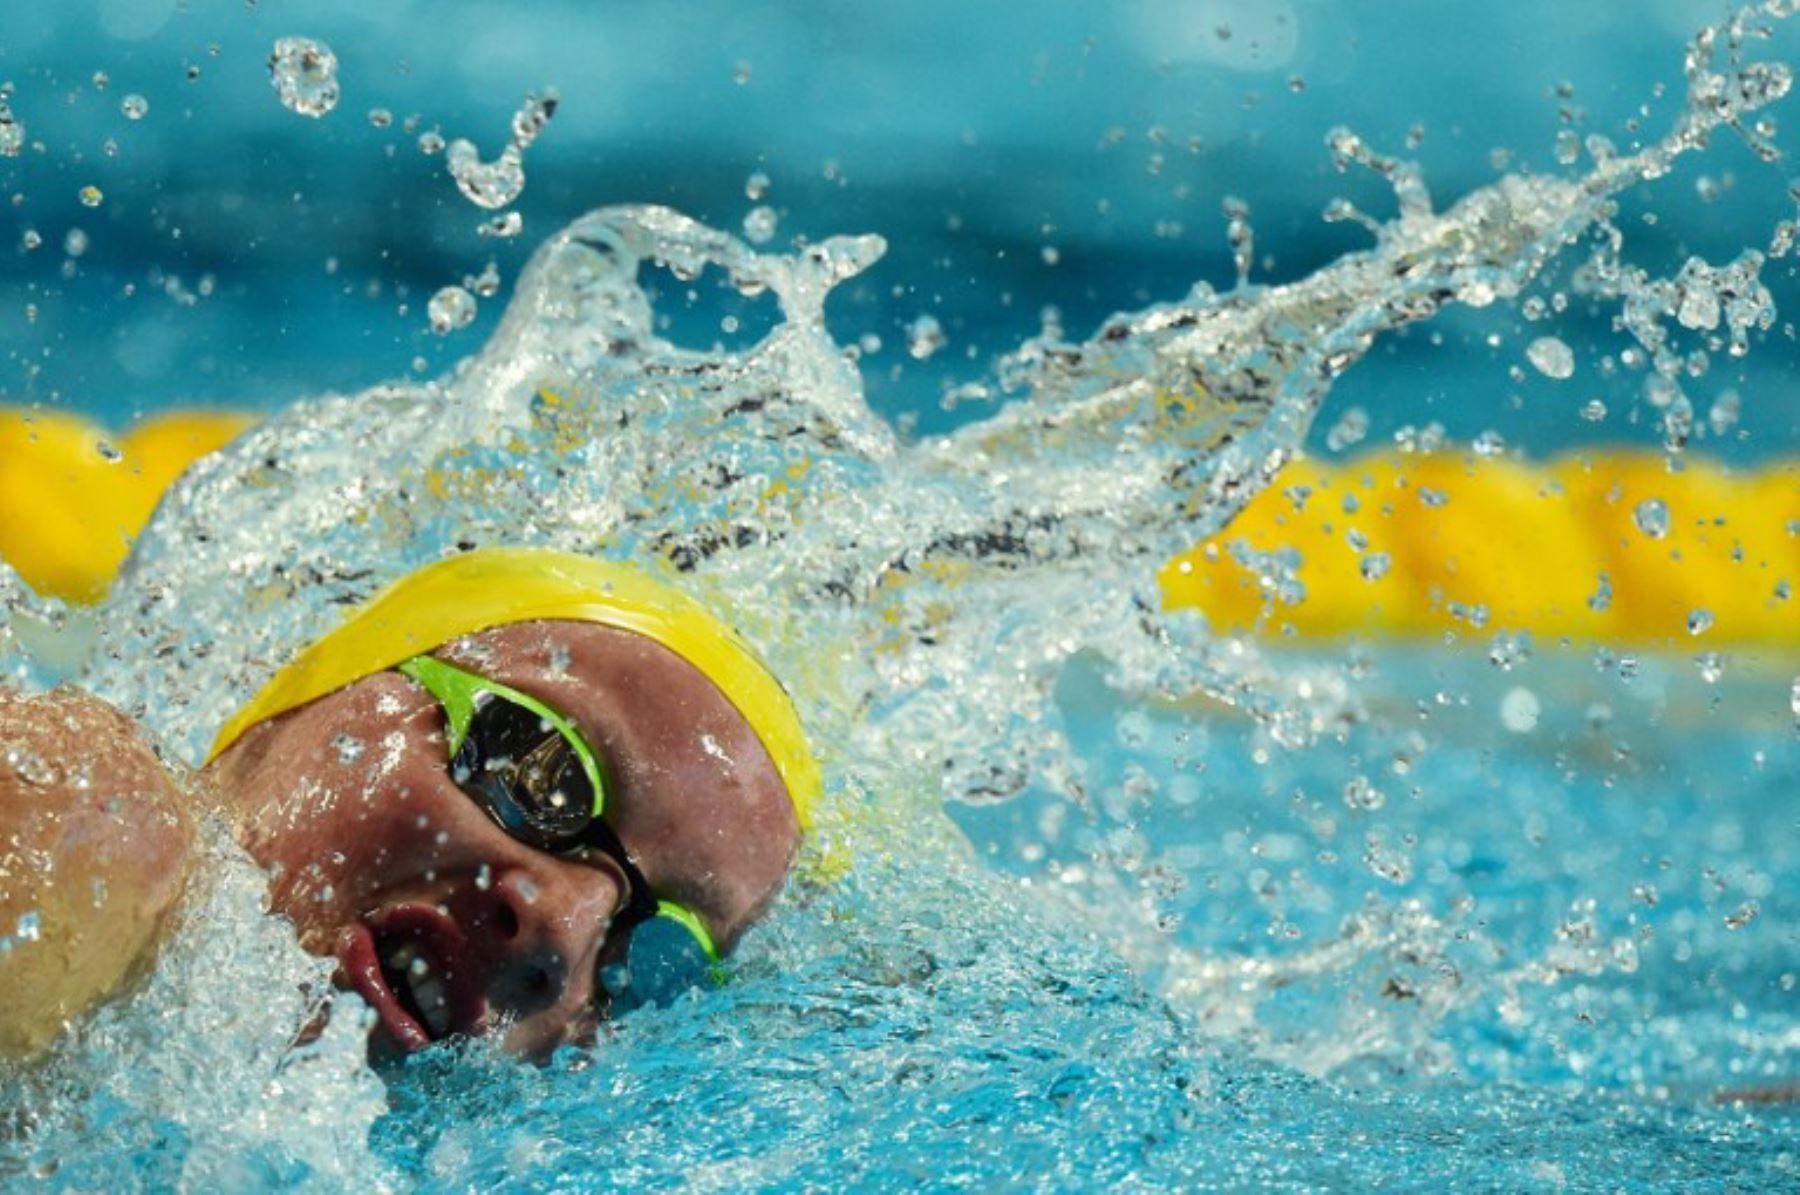 Jessica Ashwood de Australia compite en la final de estilo libre 1500m en el Campeonato Mundial FINA 2015. Foto: AFP